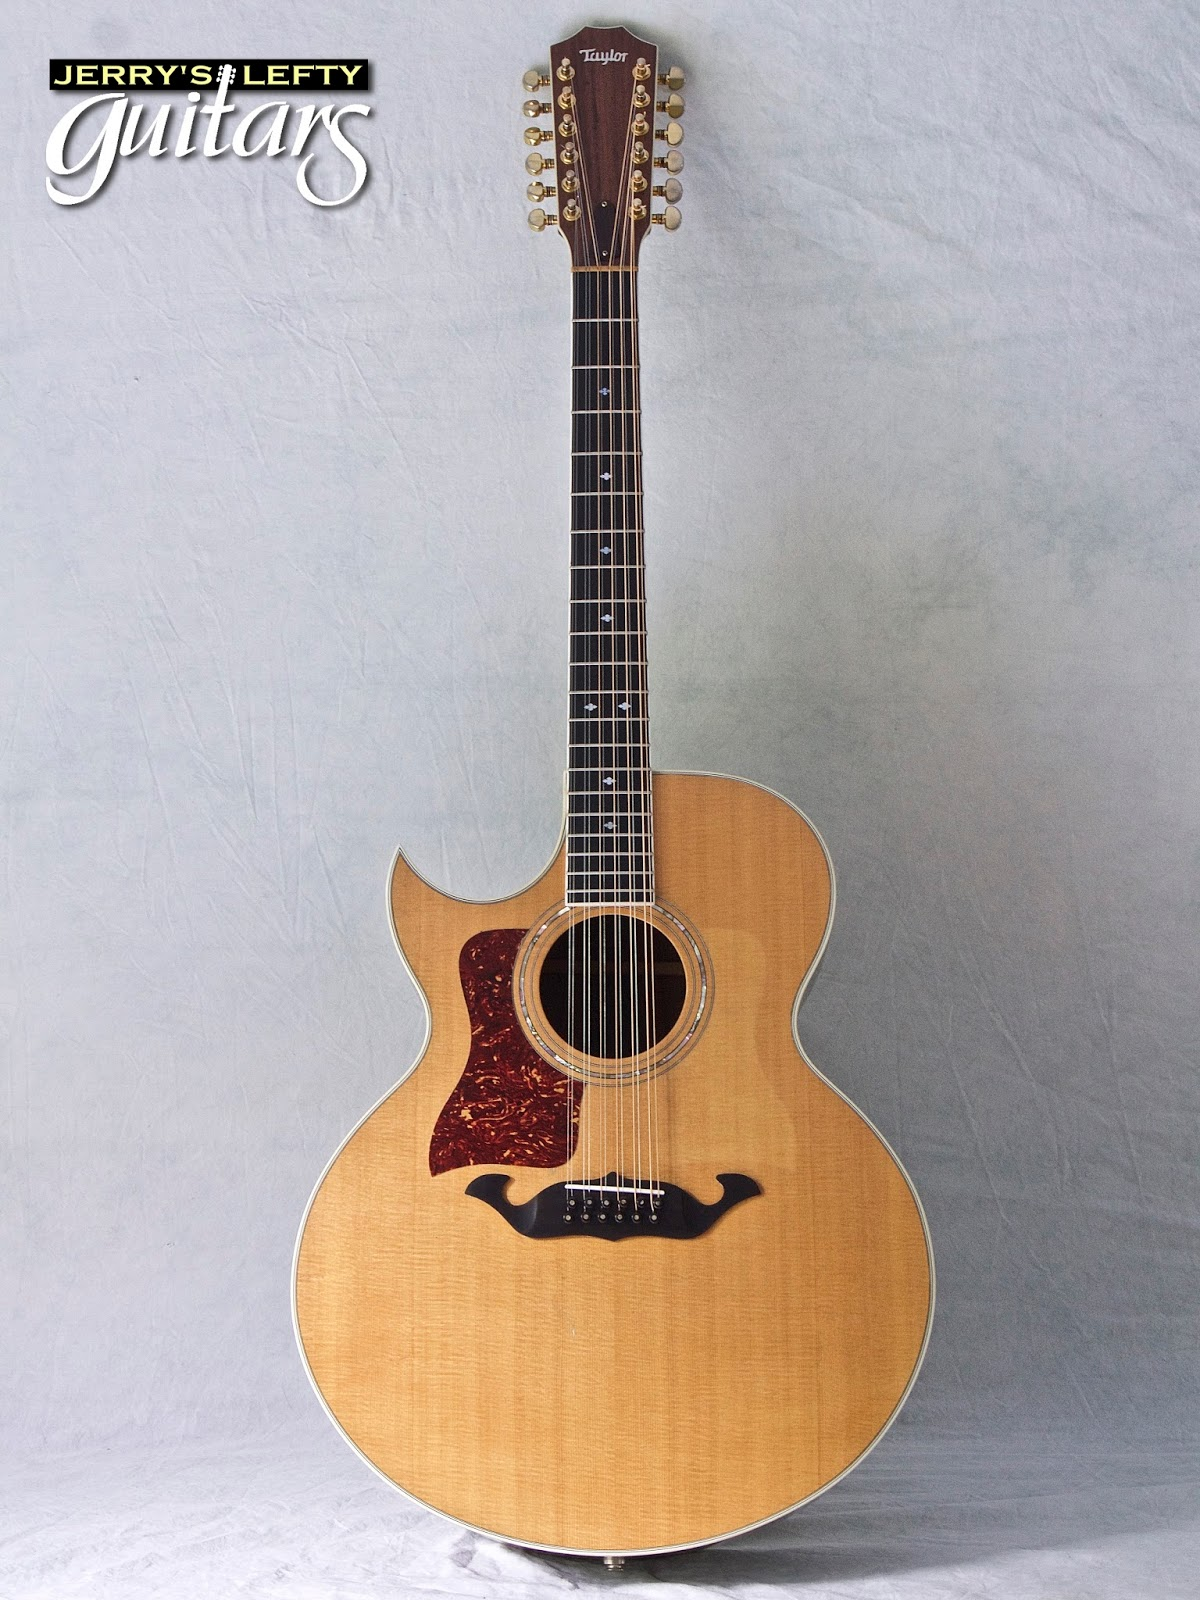 jerry 39 s lefty guitars newest guitar arrivals updated weekly 1984 taylor 855ce 12 string left. Black Bedroom Furniture Sets. Home Design Ideas